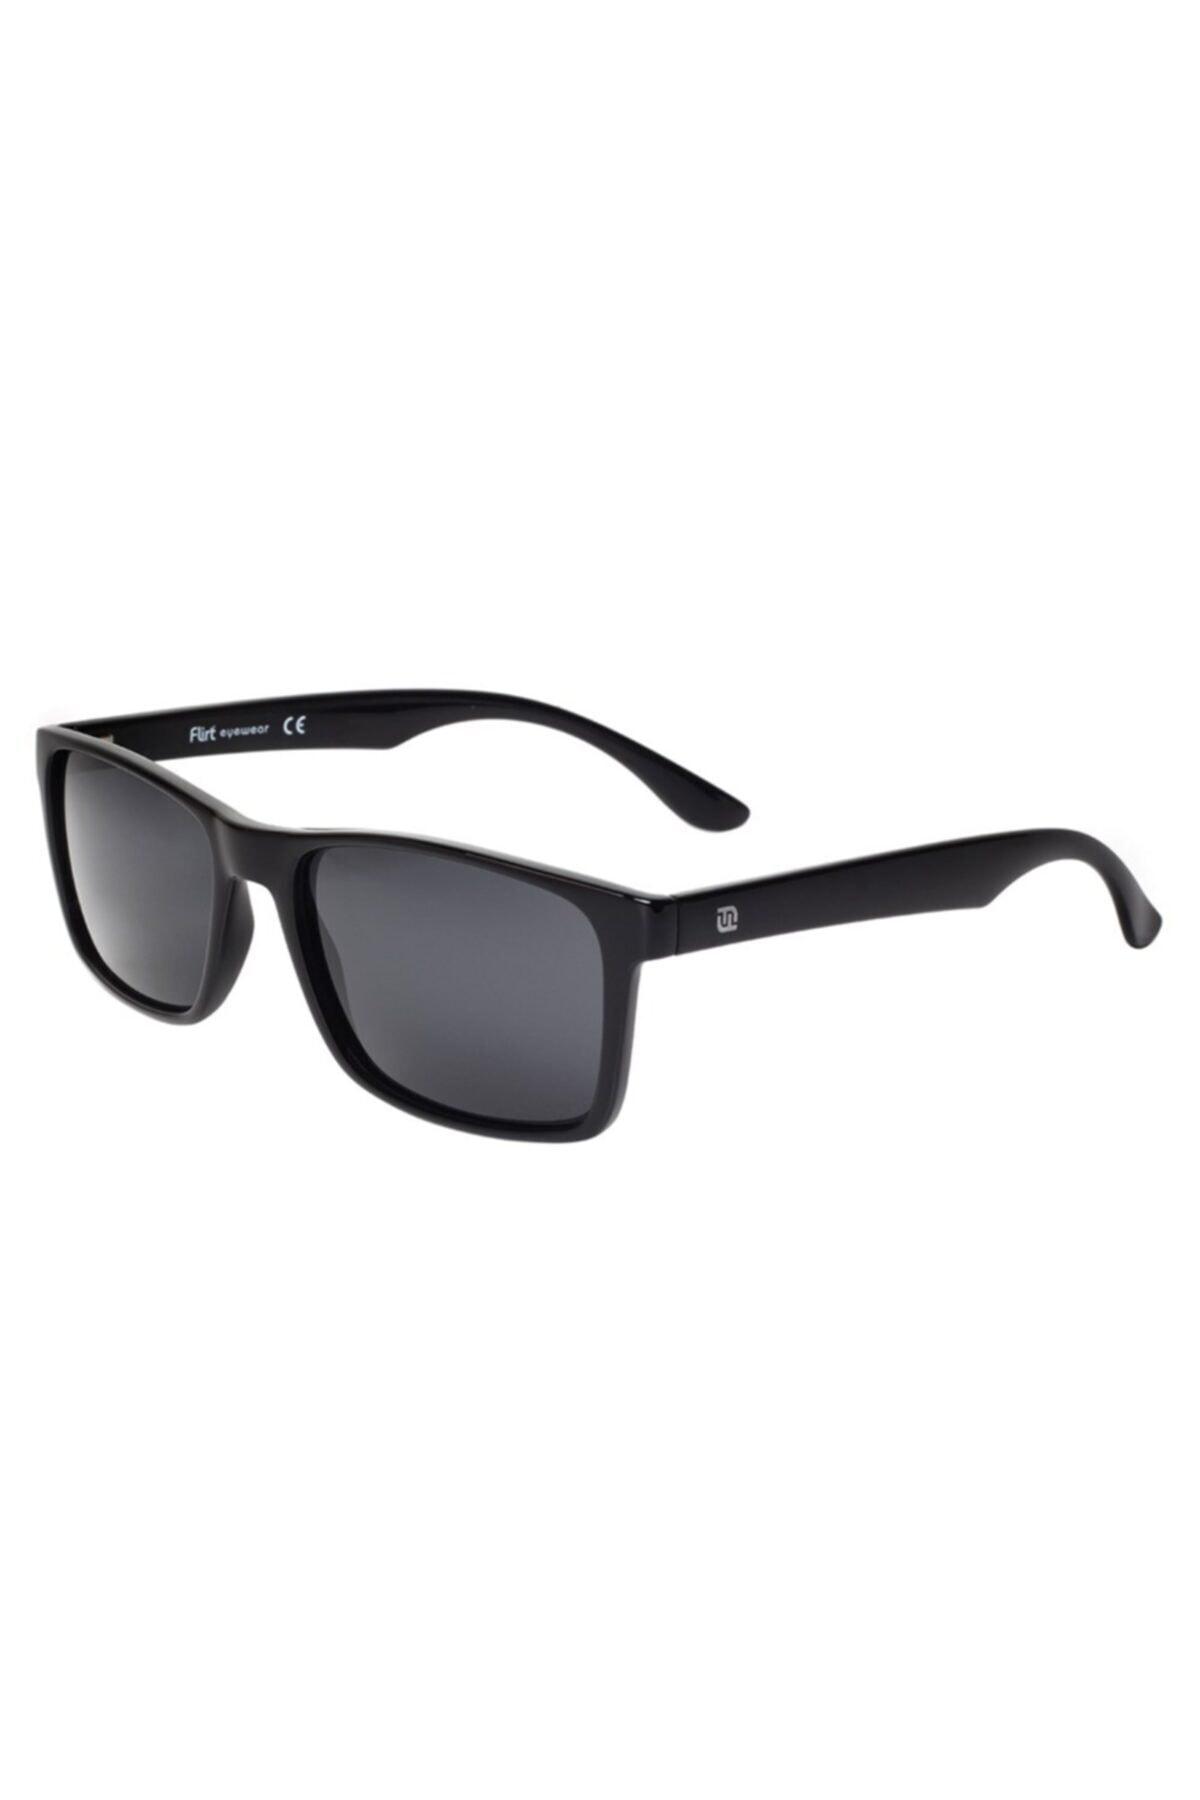 عینک آفتابی خاص برند Flirt رنگ مشکی کد ty68136250